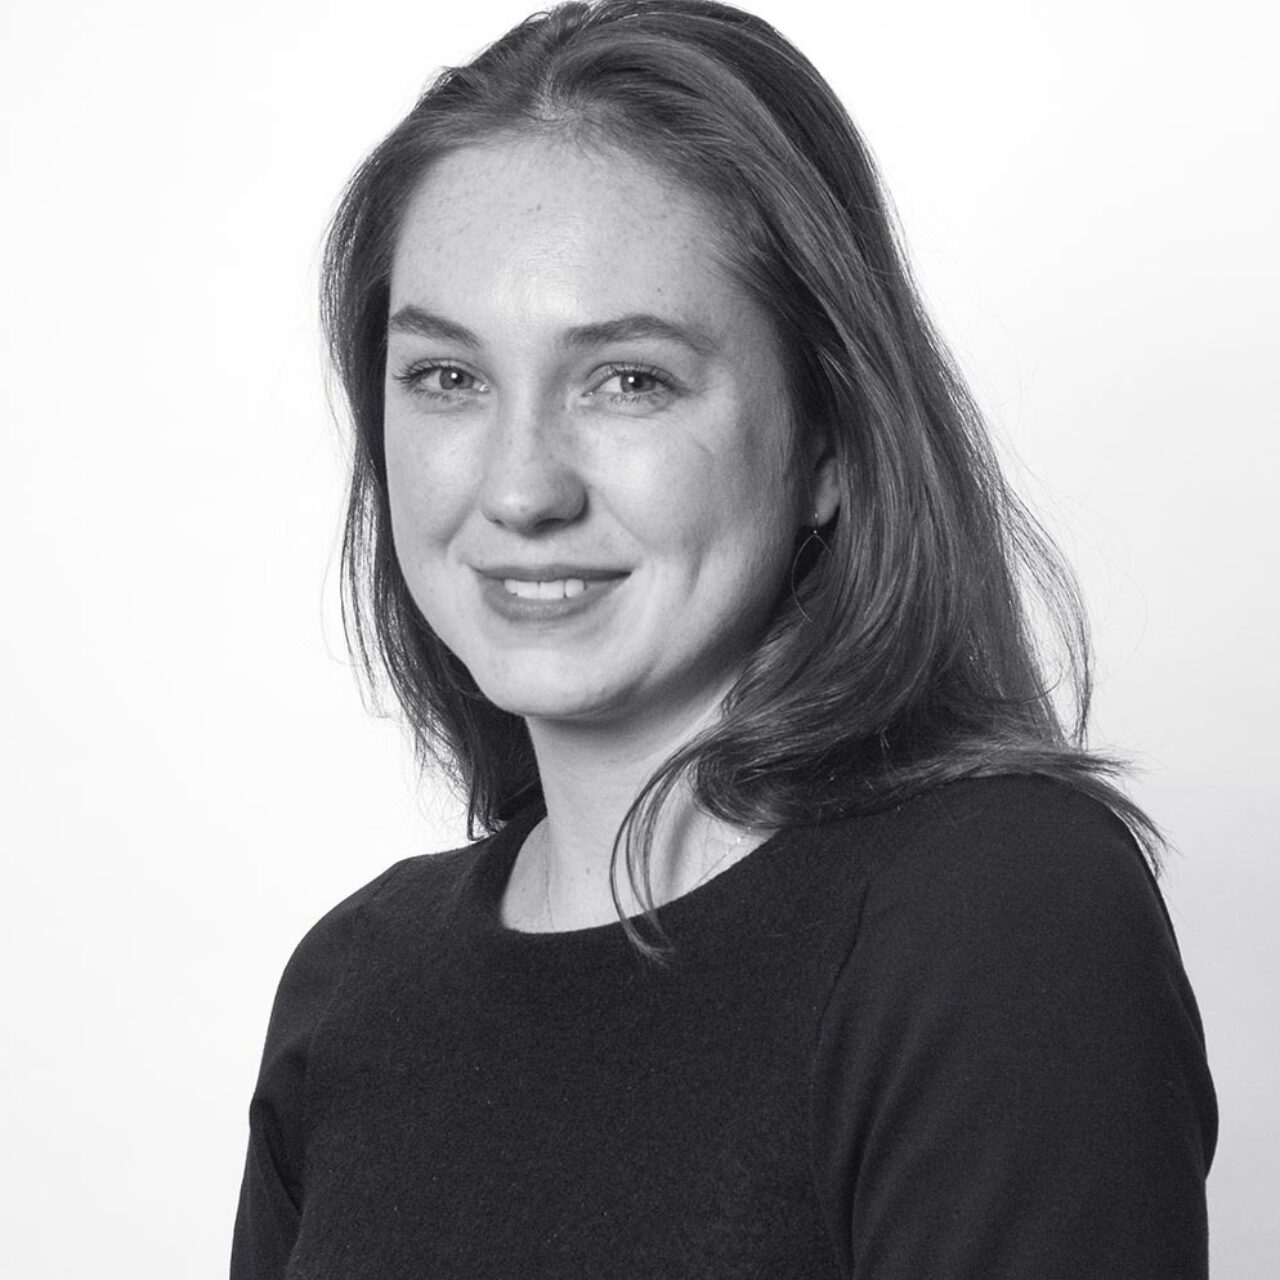 Fiona Koch, Account Director at Raw London